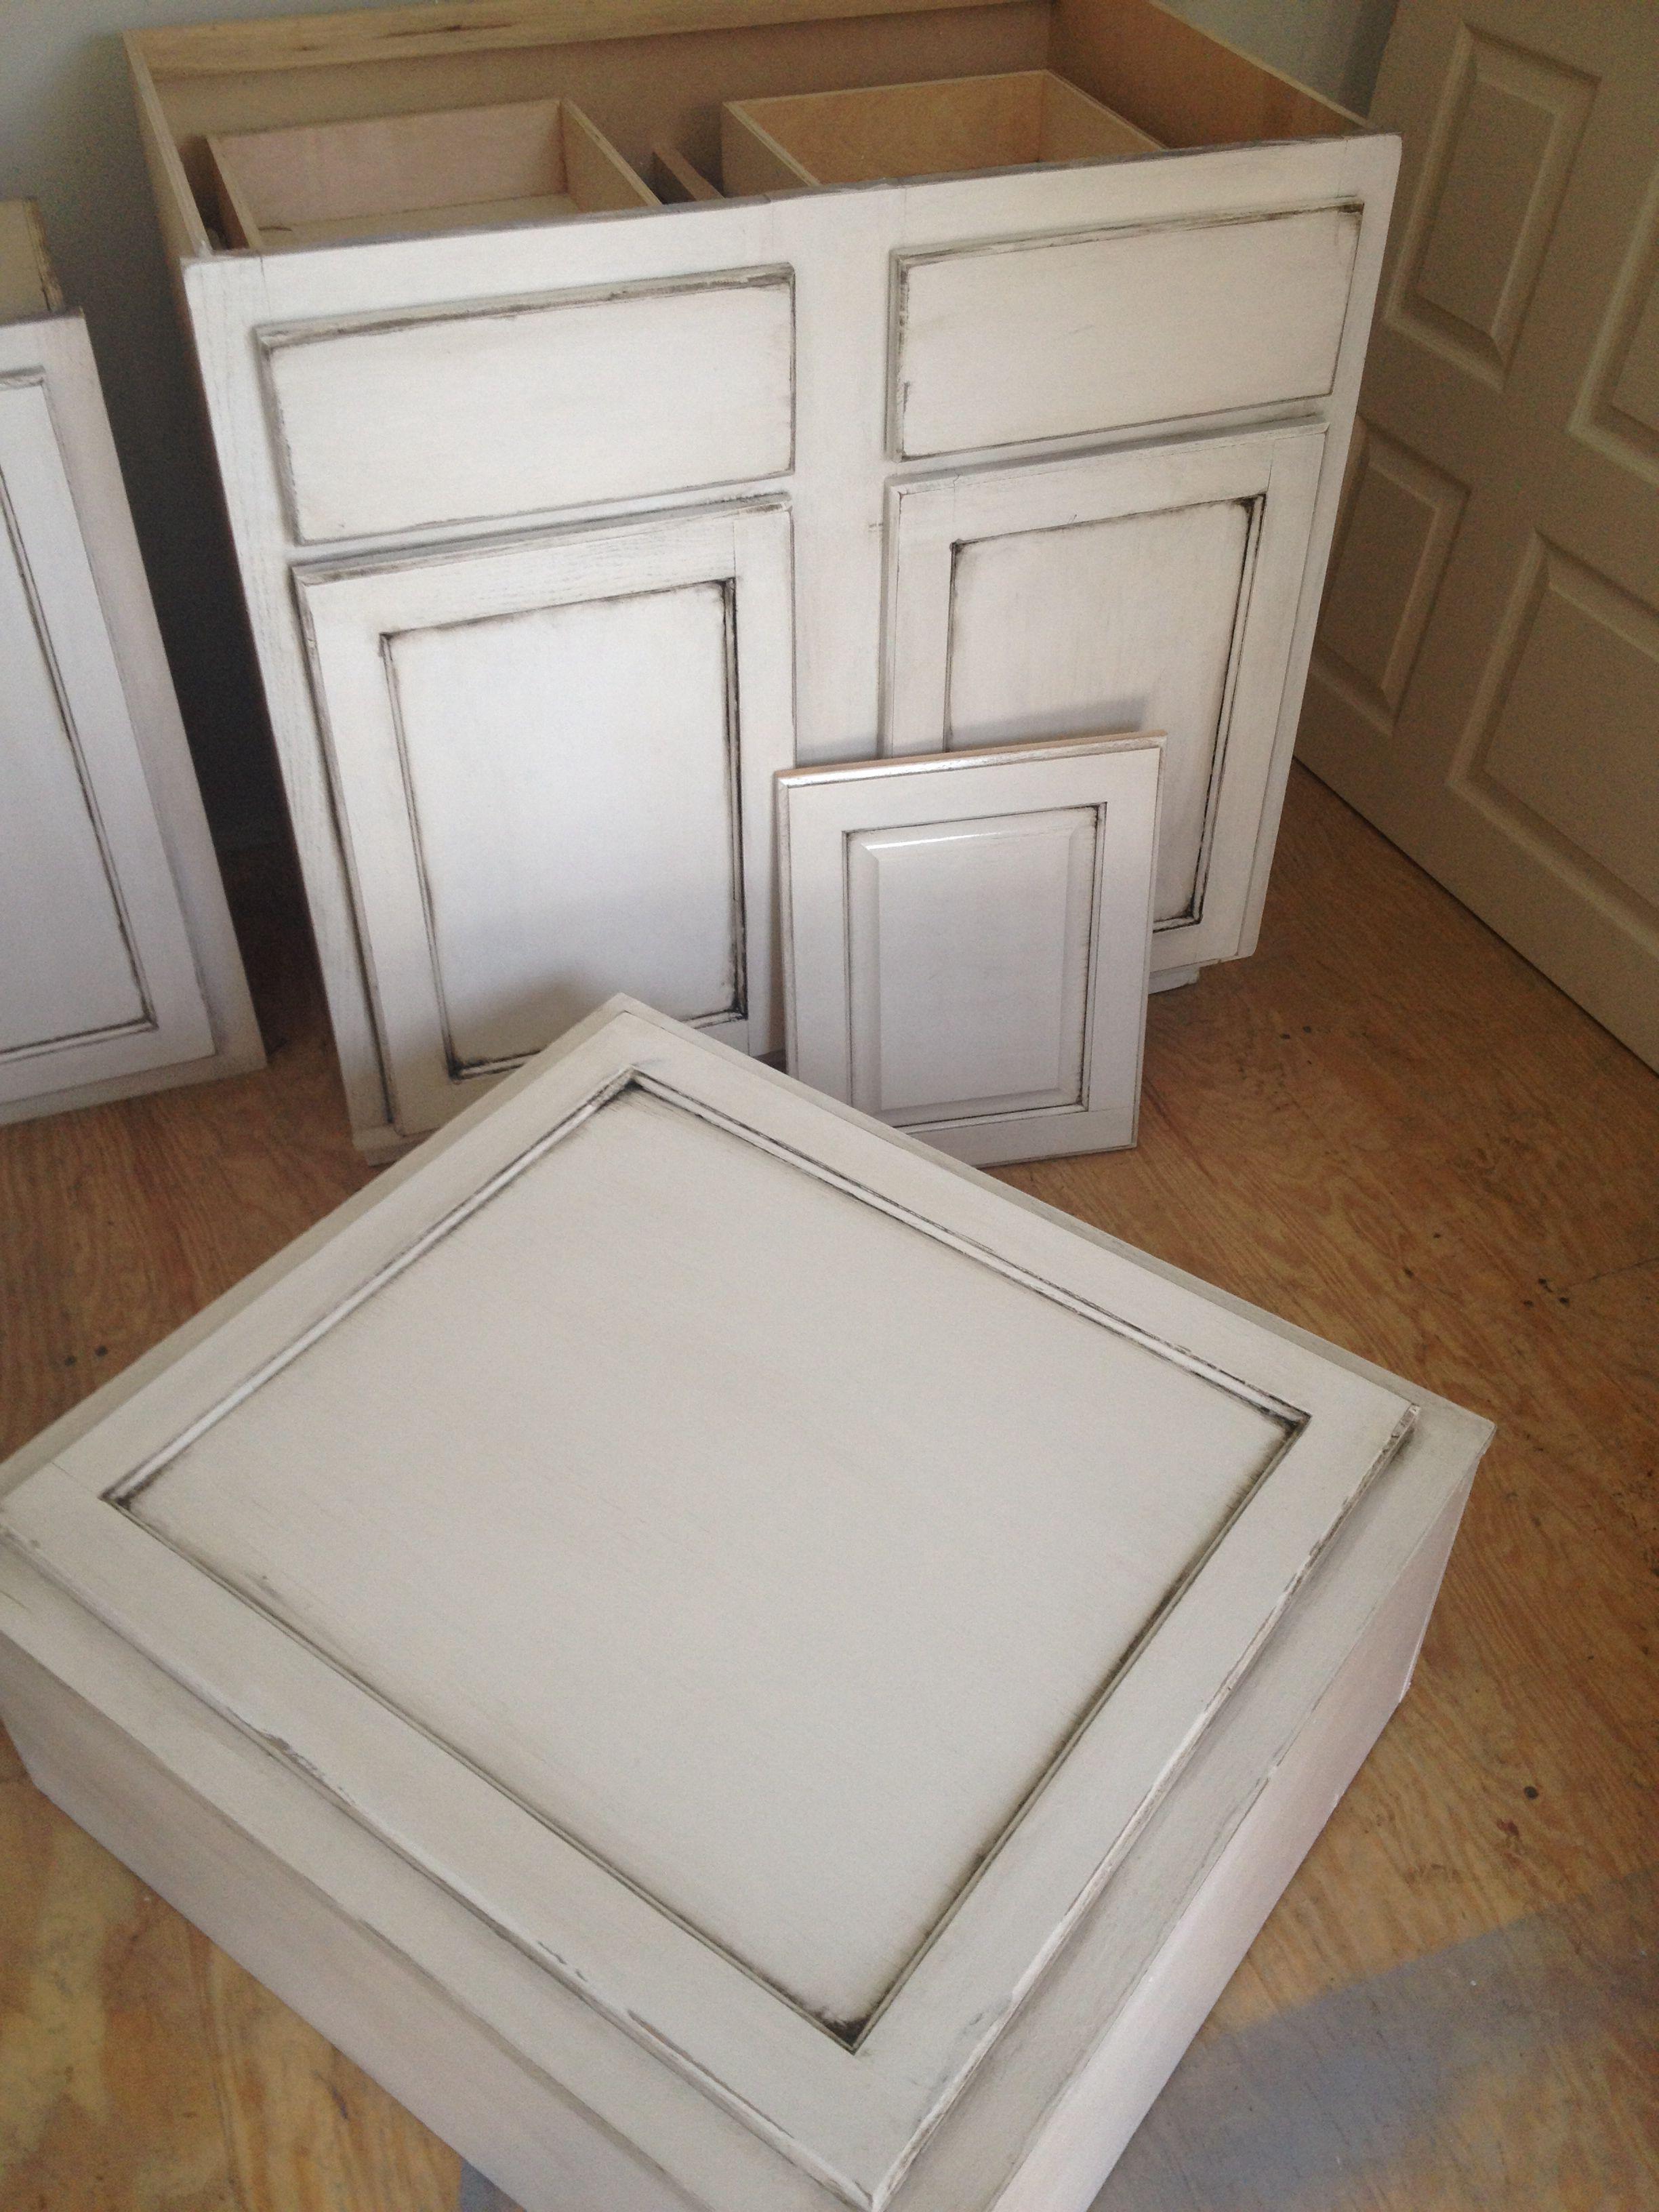 Painting oak cabinets antique white